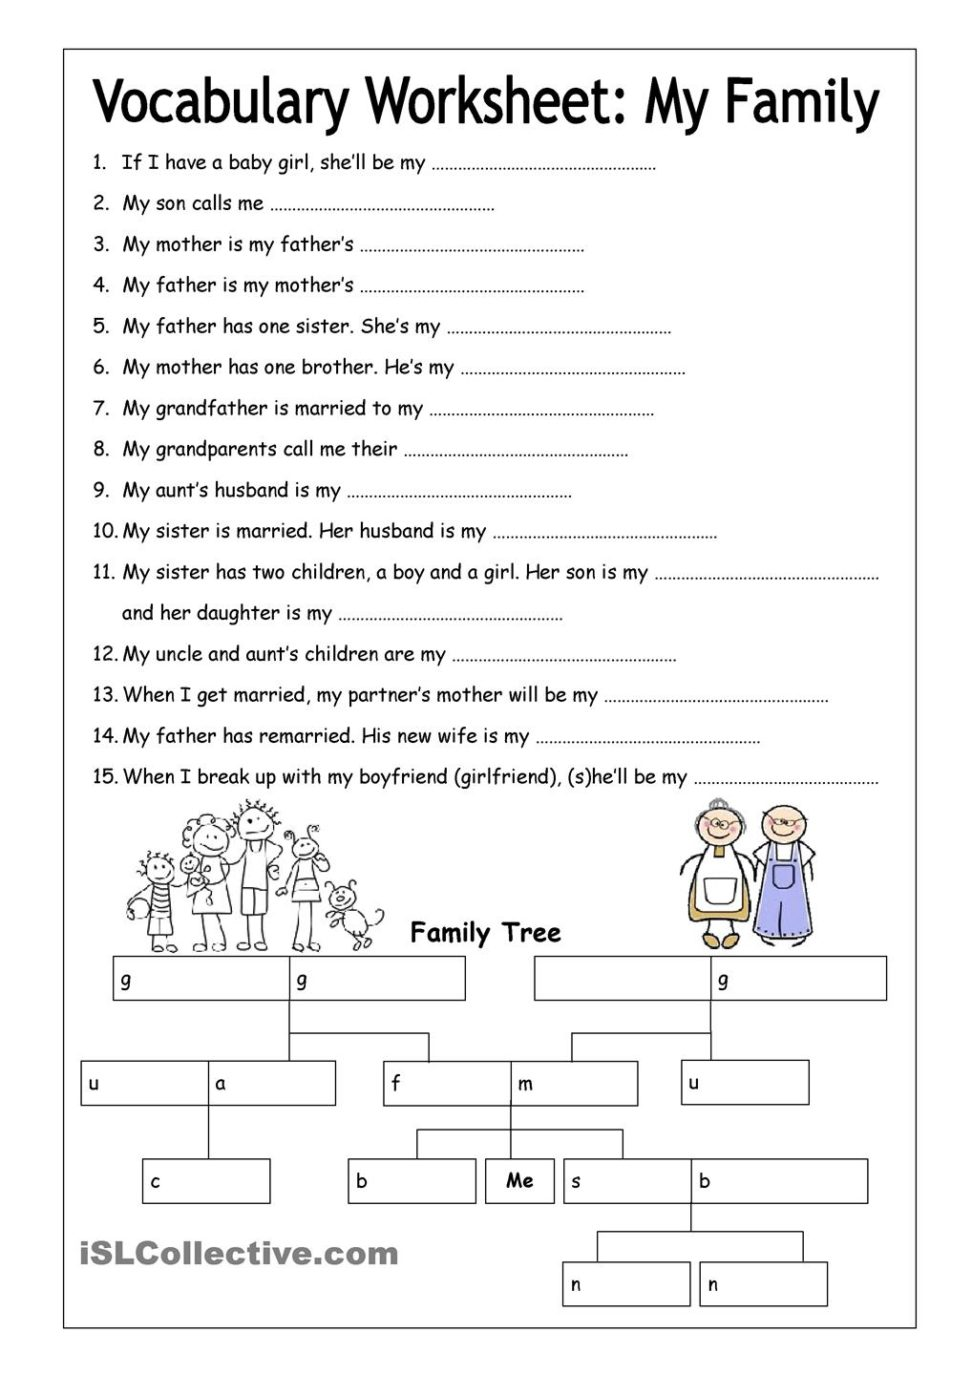 Dewey Decimal System Worksheet Free Worksheets For Elementary